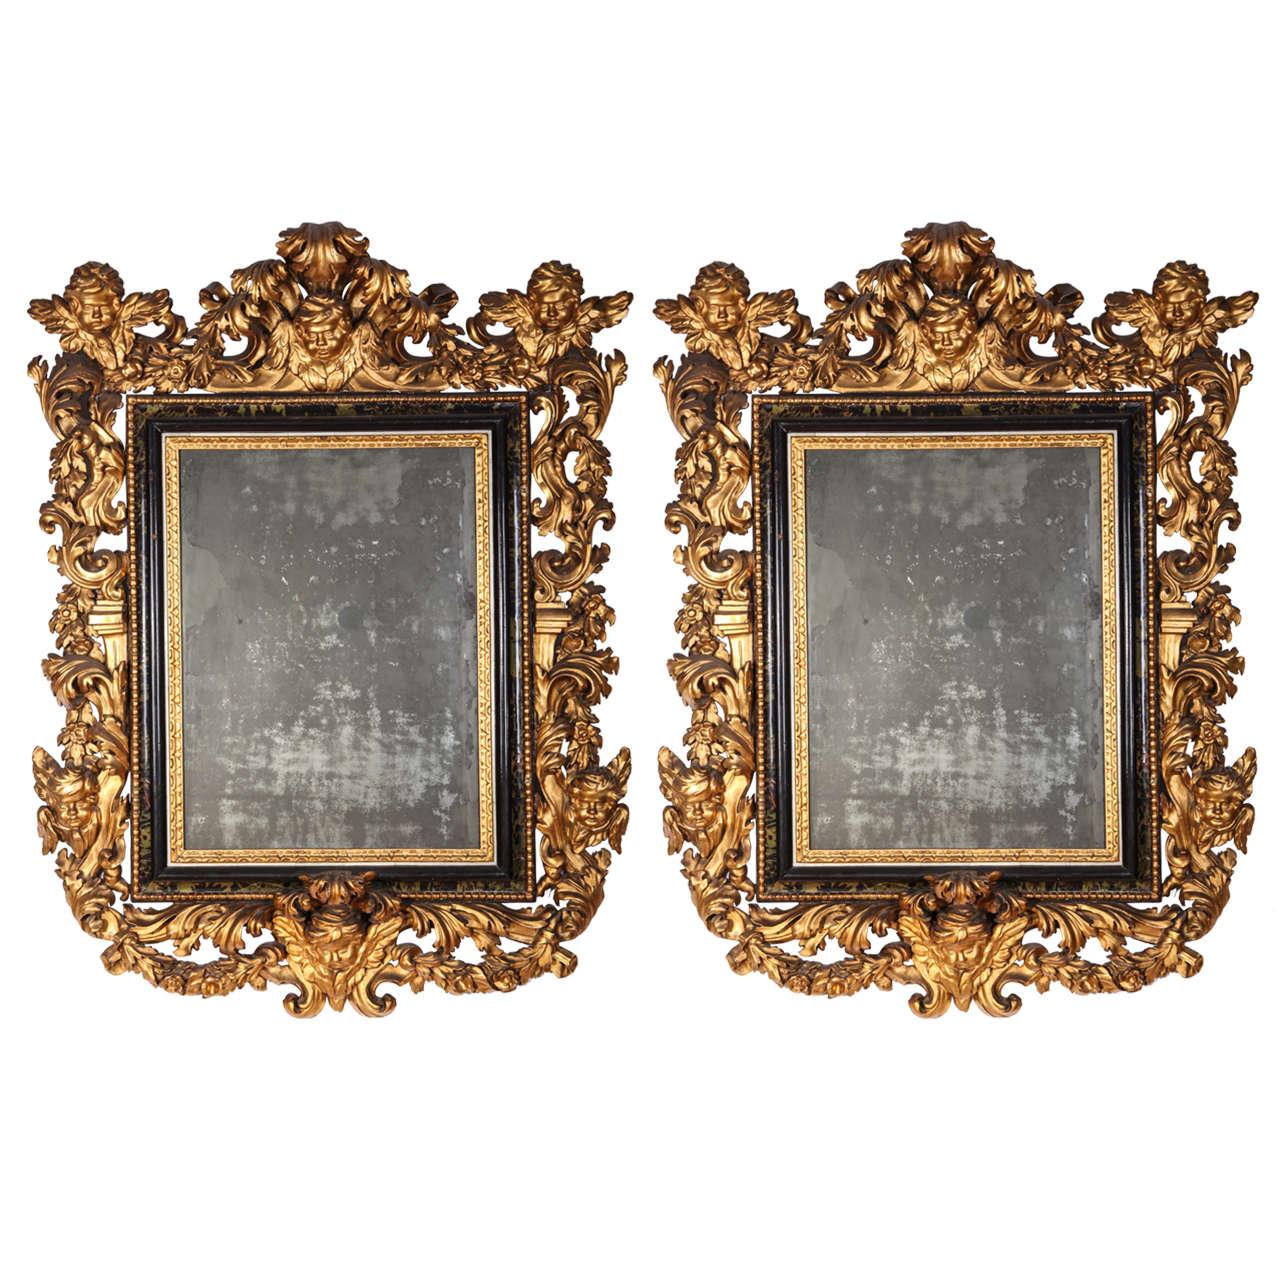 Stunning Pair of Carved Italian Giltwood Mirrors 17' century